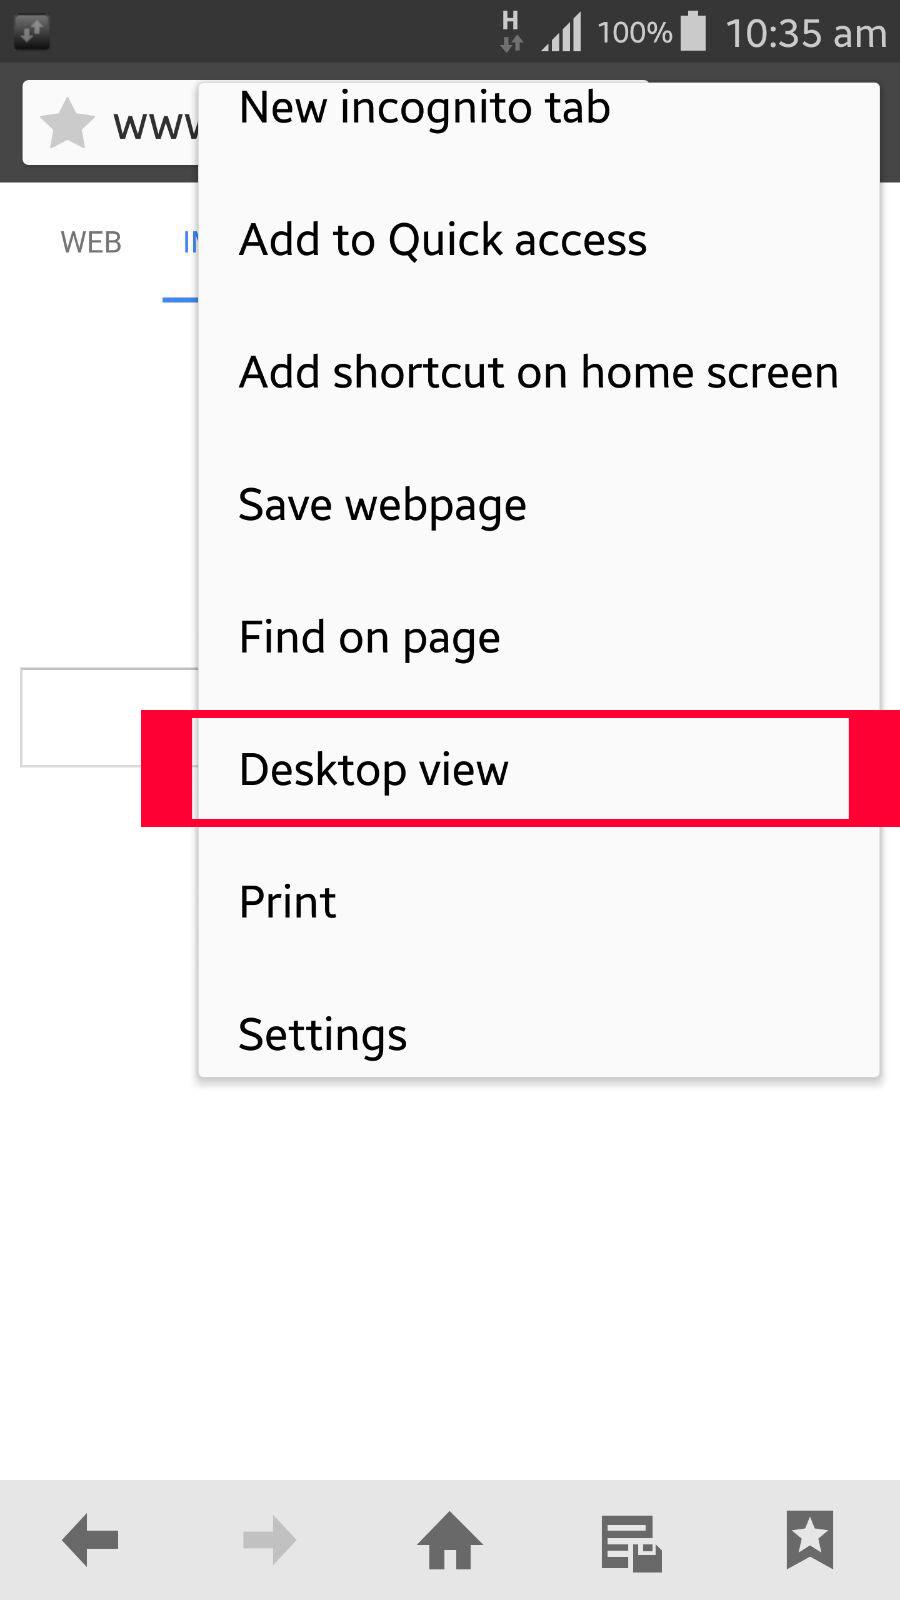 2 select desktop view